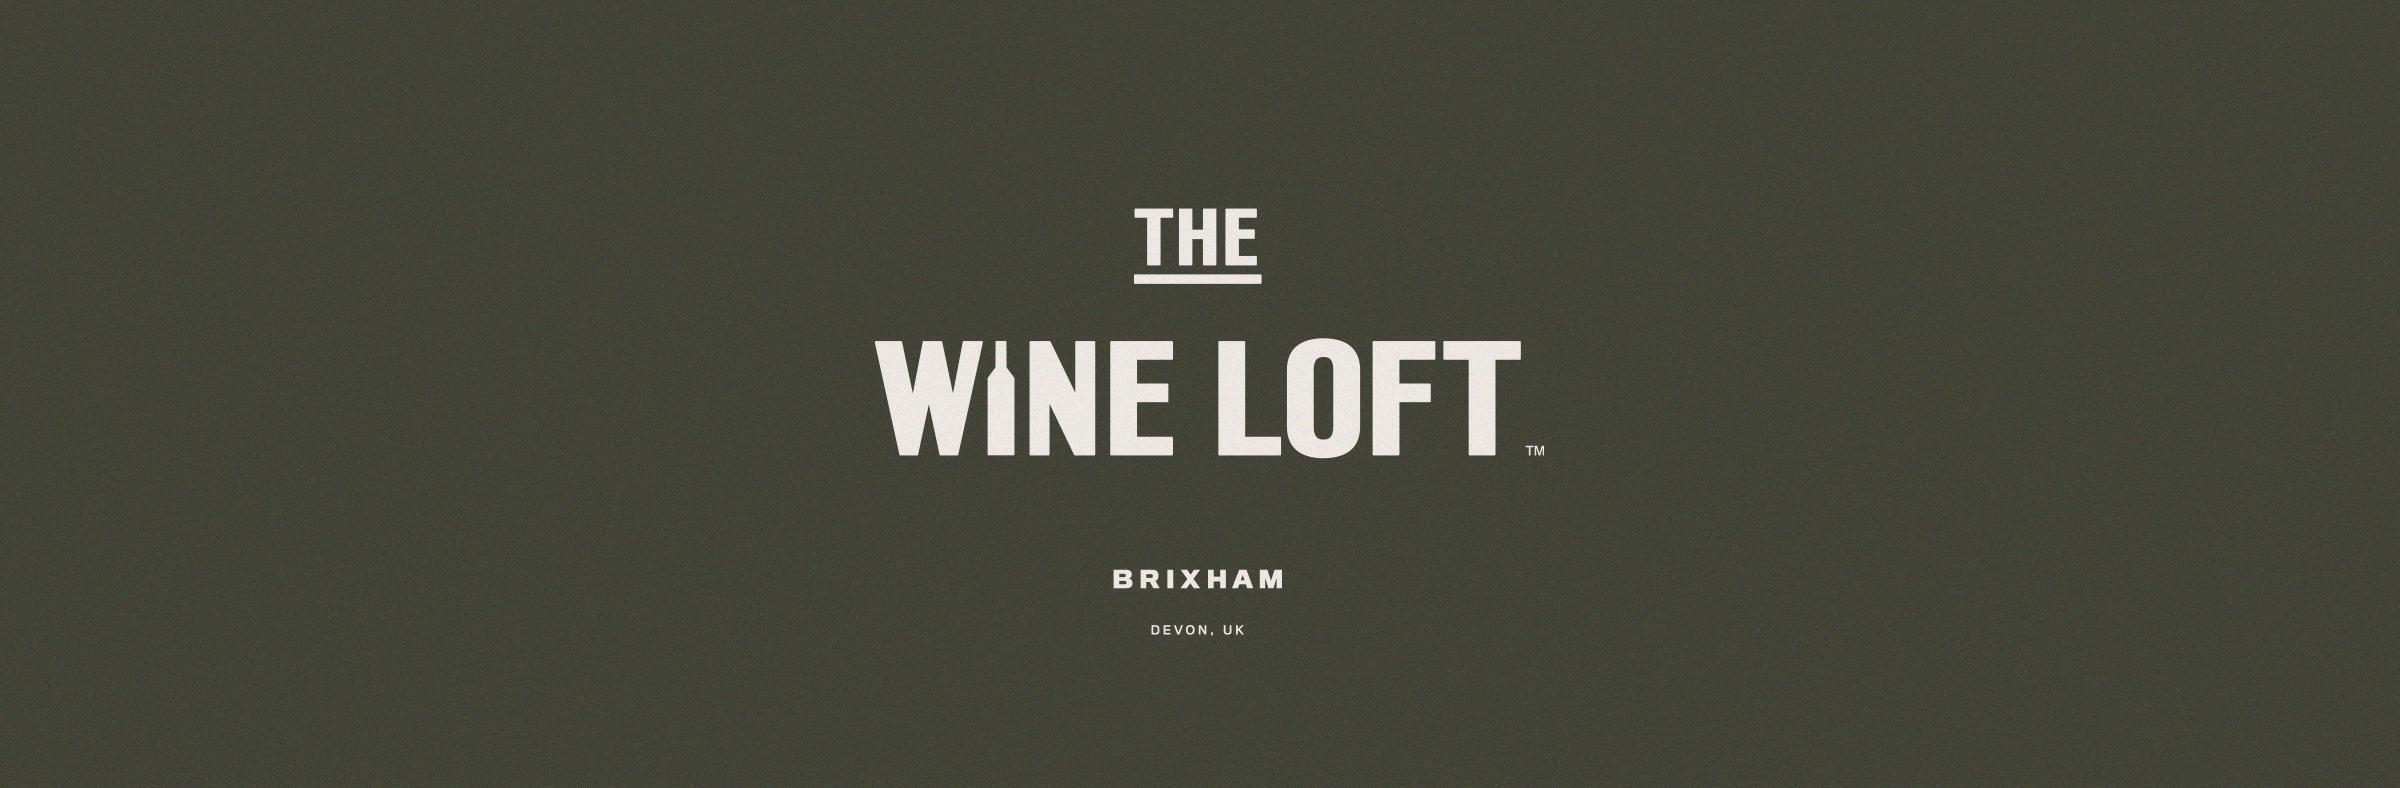 The Wine Loft brand logo white on green